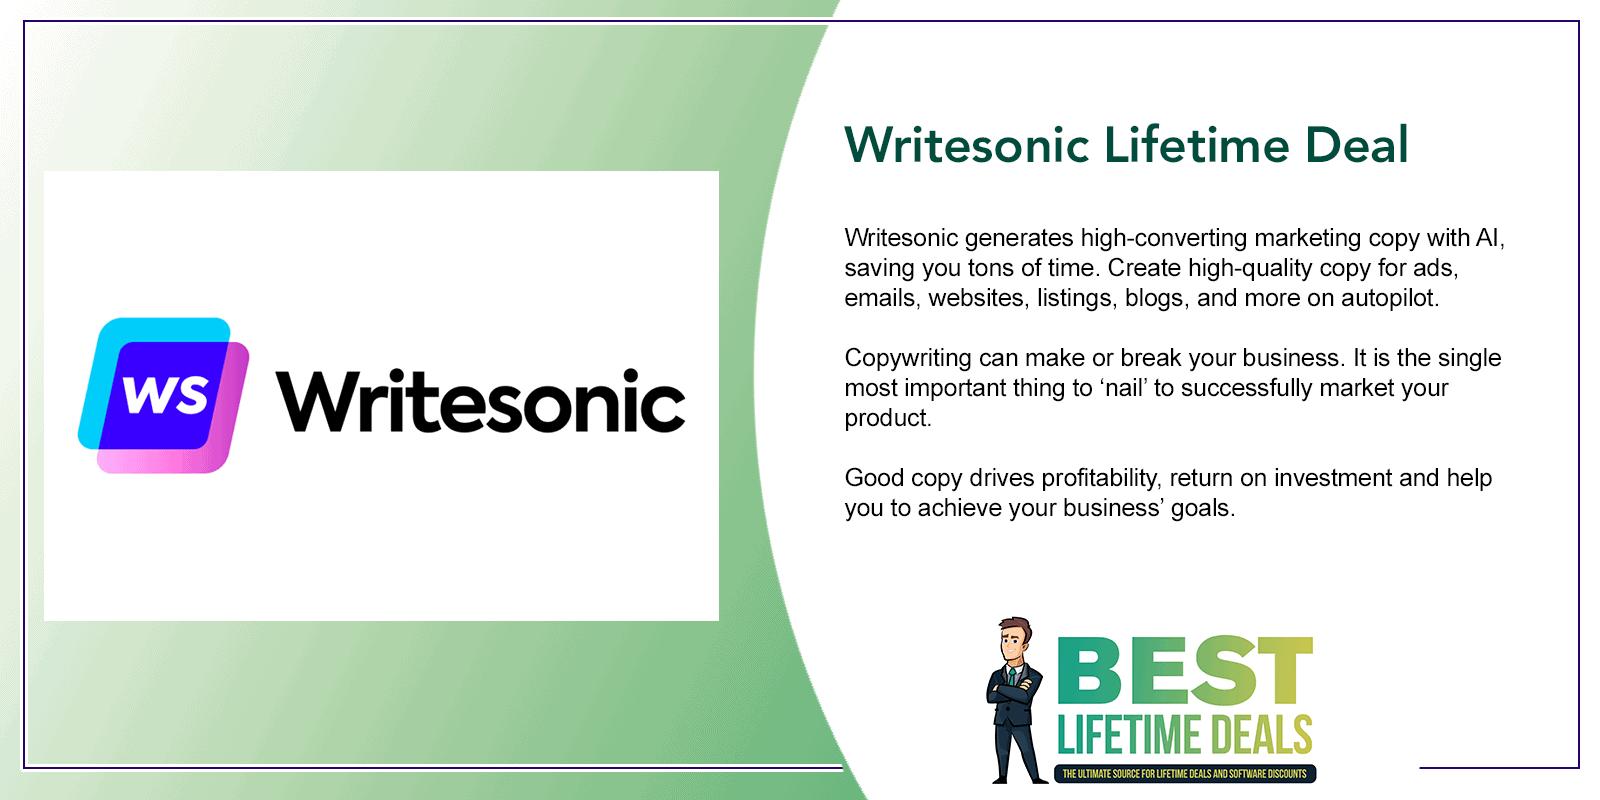 Writesonic Lifetime Deal Post Image